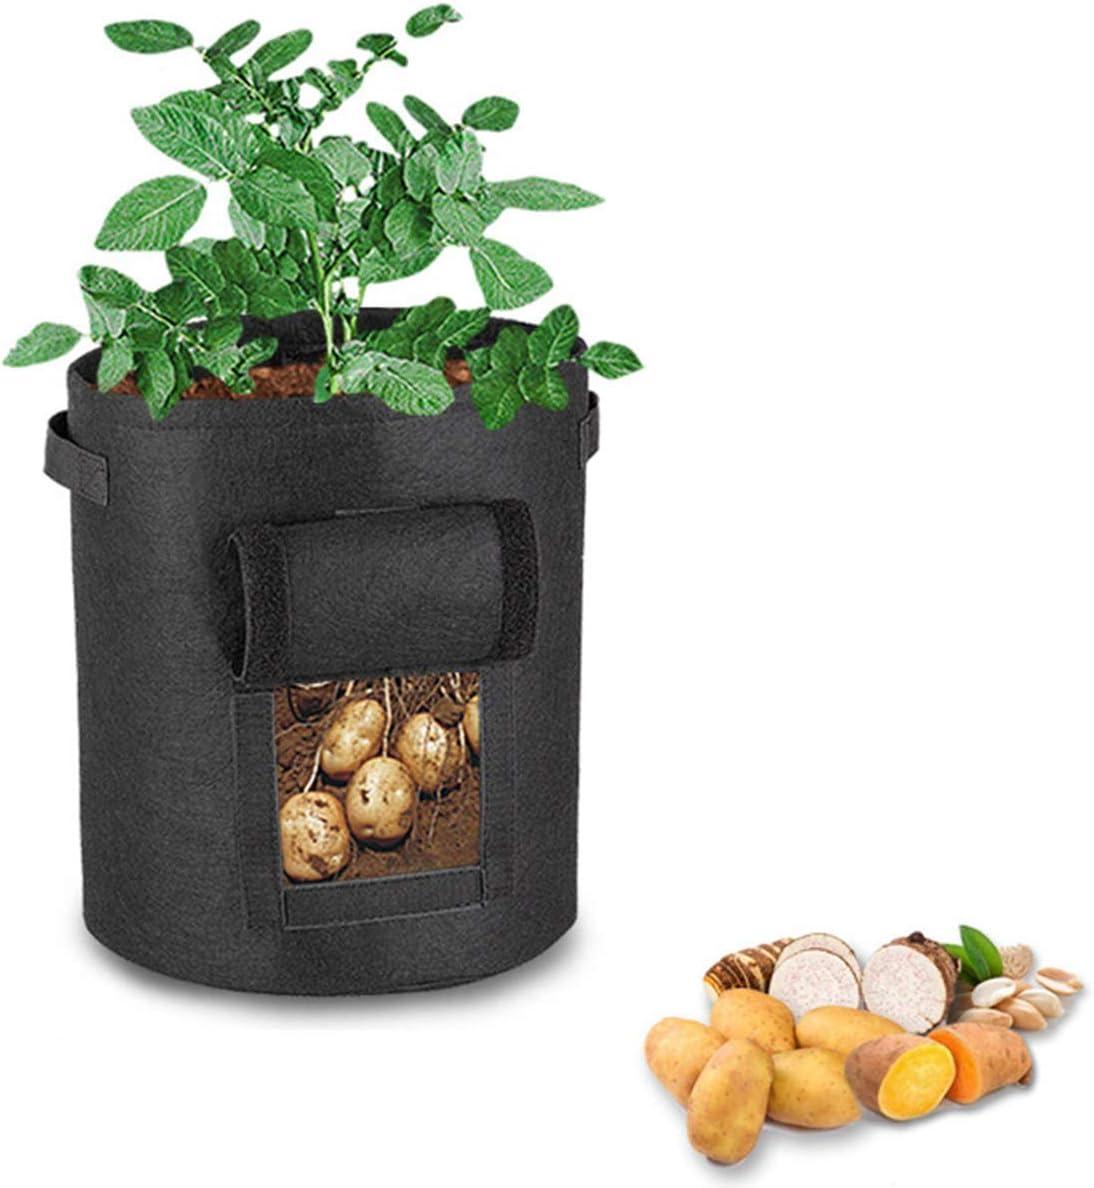 ETDWA DIY Potato Tomato Grow Planter PE Planting Container Bag Vegetable Gardening Thicken Garden Pot Planting Grow Bag,3PCS,28 33CM